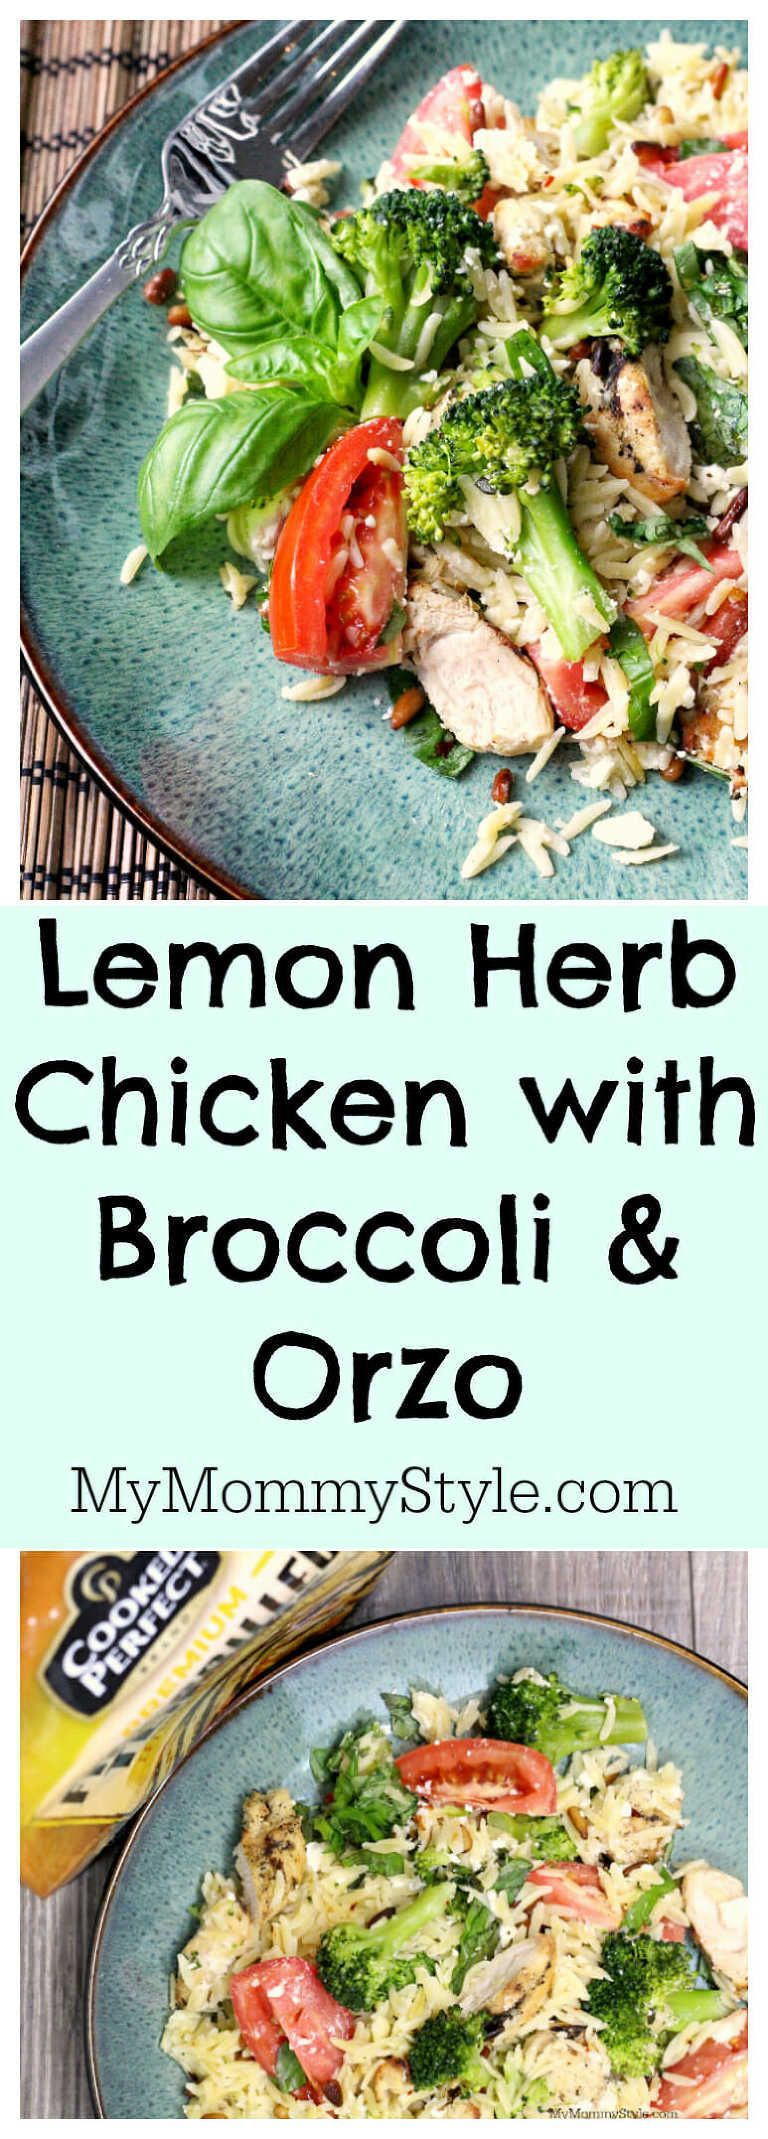 Lemon Chicken With Broccoli And Orzo Recipe In 20 Minutes Recipe Grilled Lemon Chicken Recipes Marinated Chicken Recipes